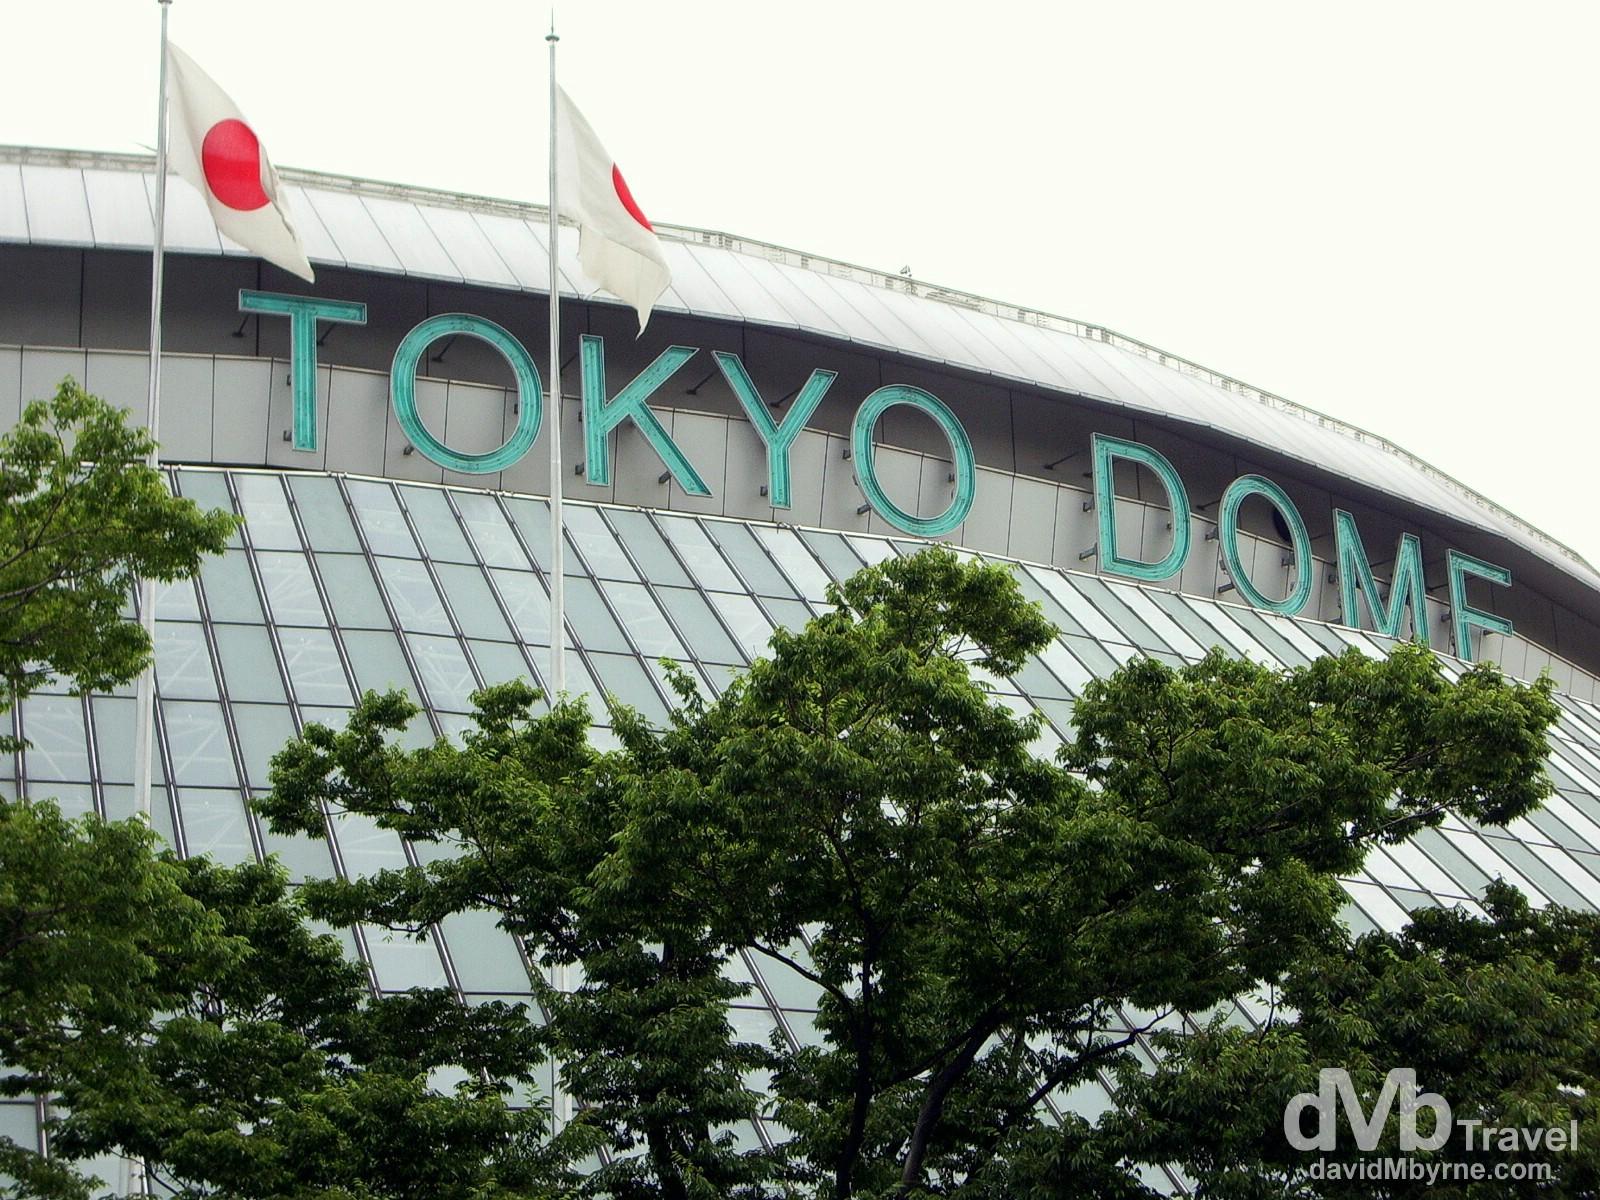 Tokyo Dome, Tokyo, Japan. July 13th, 2005.